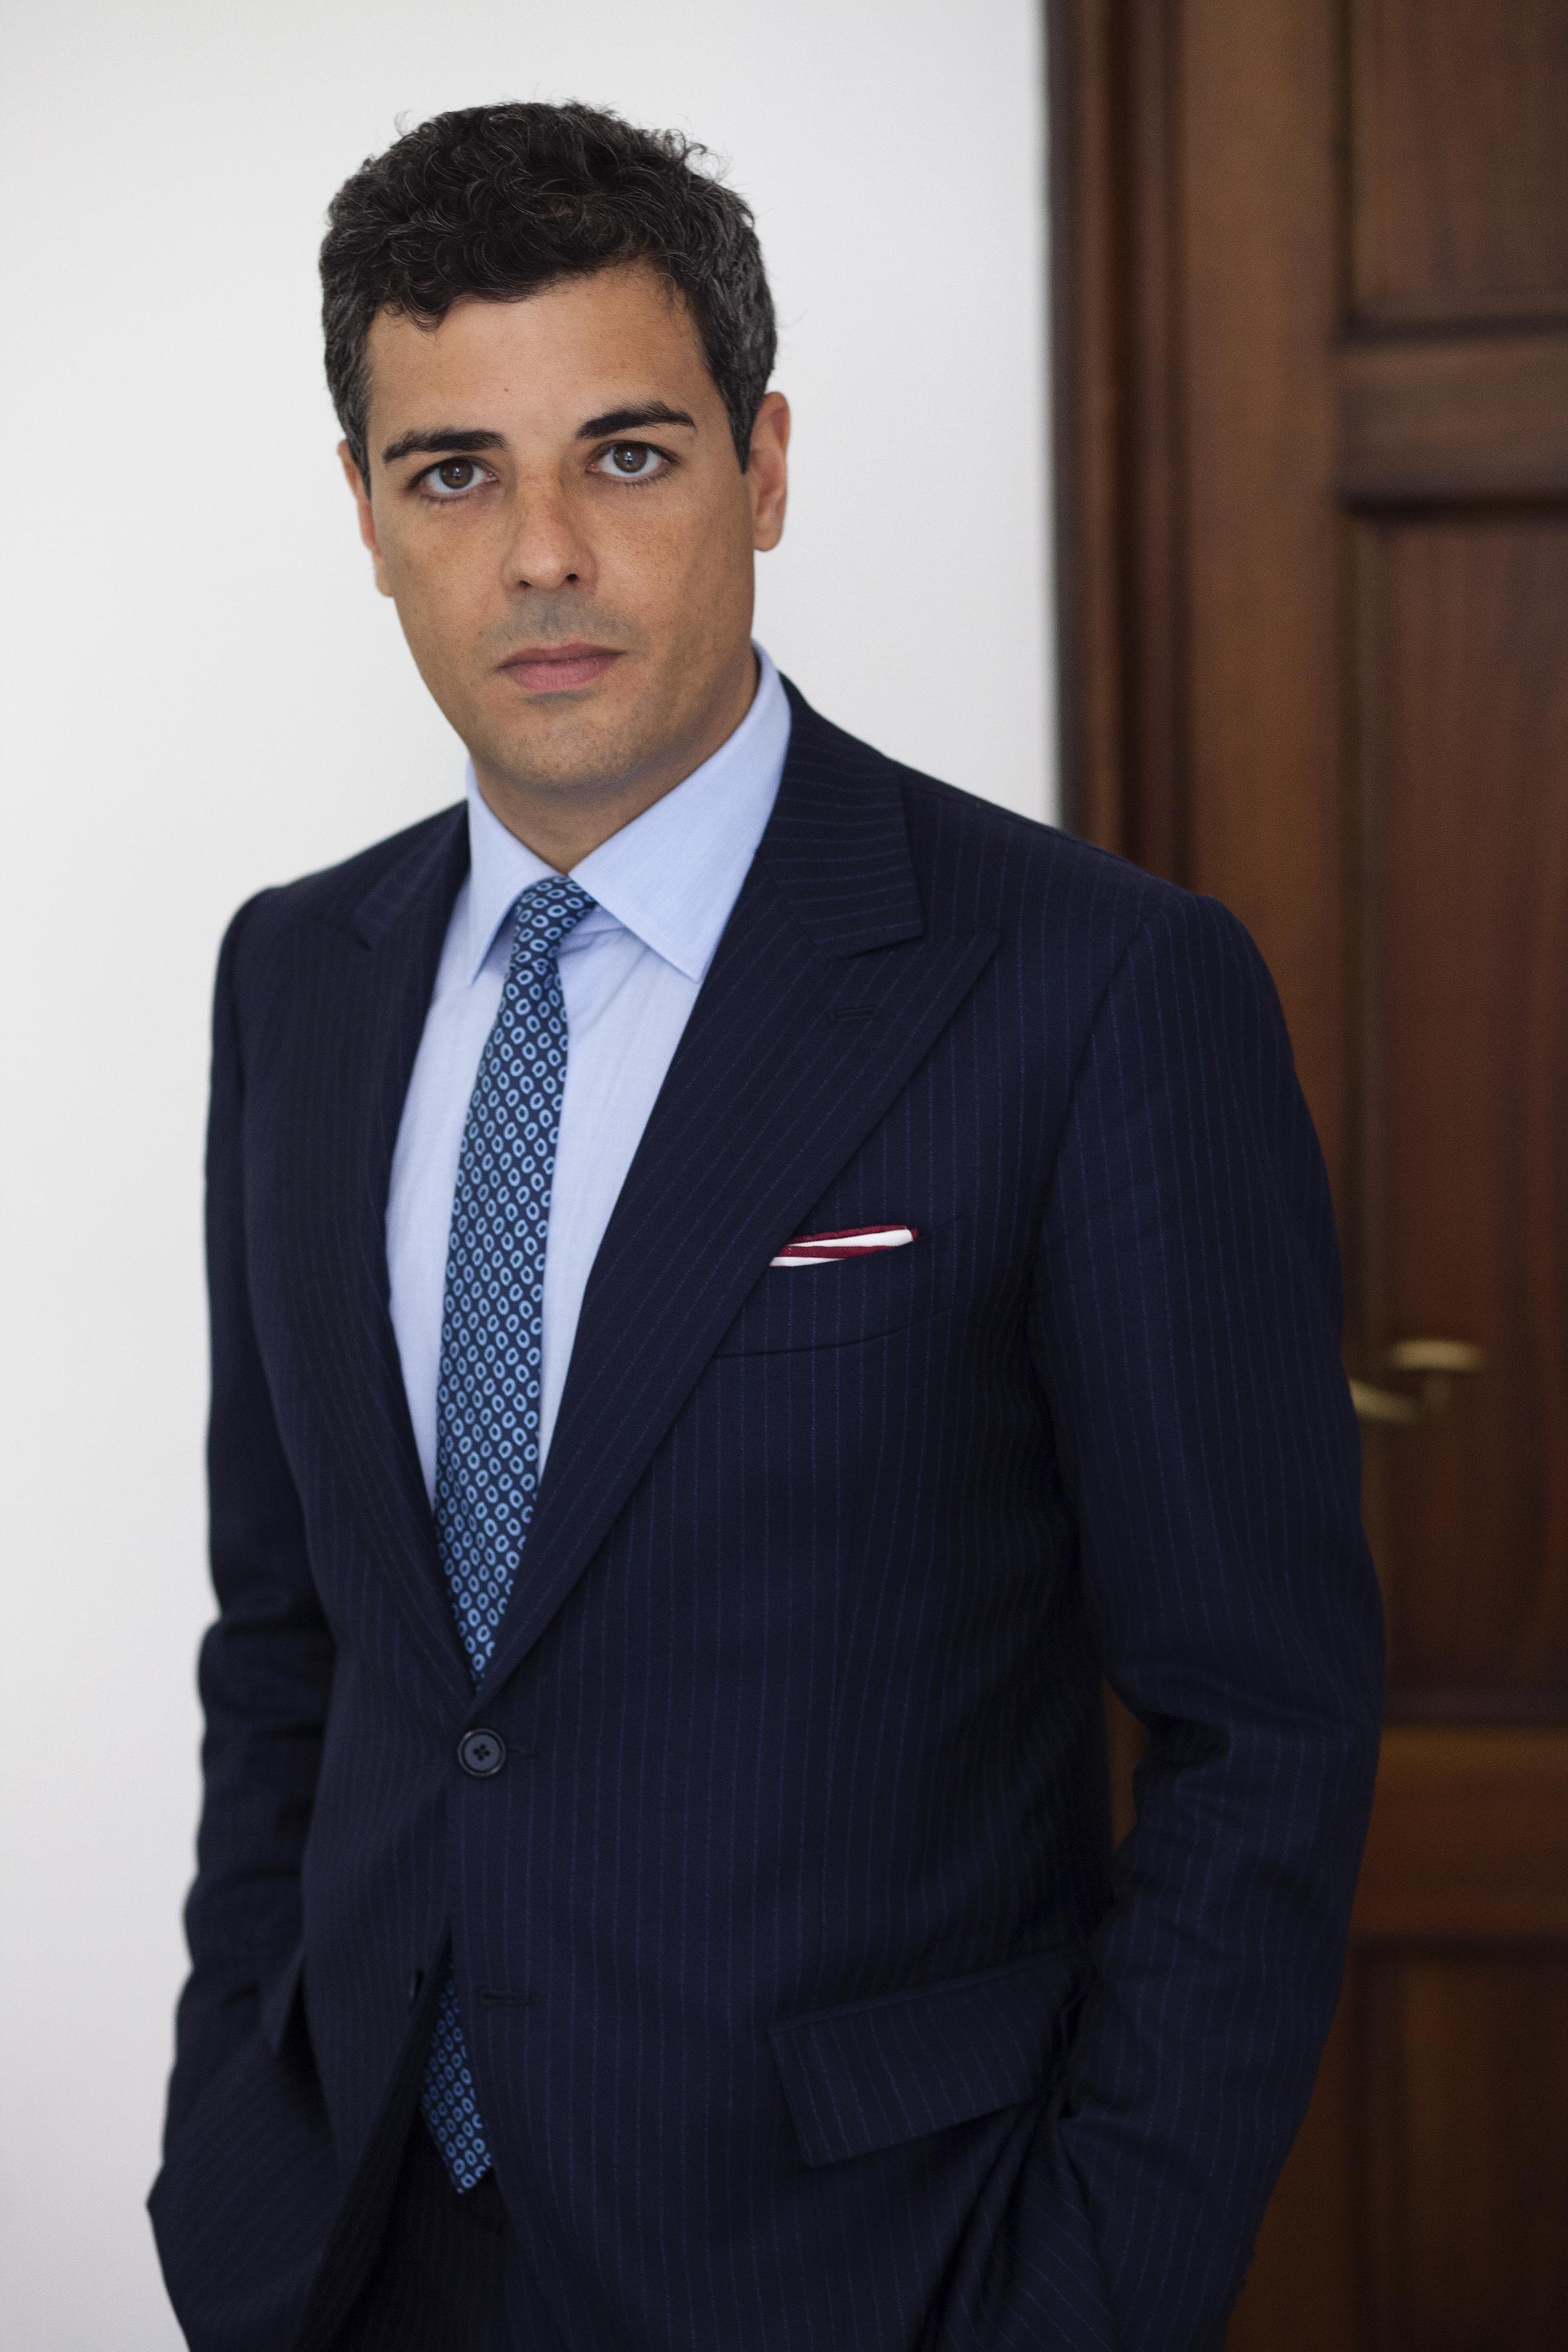 Avv. Francesco Dagnino